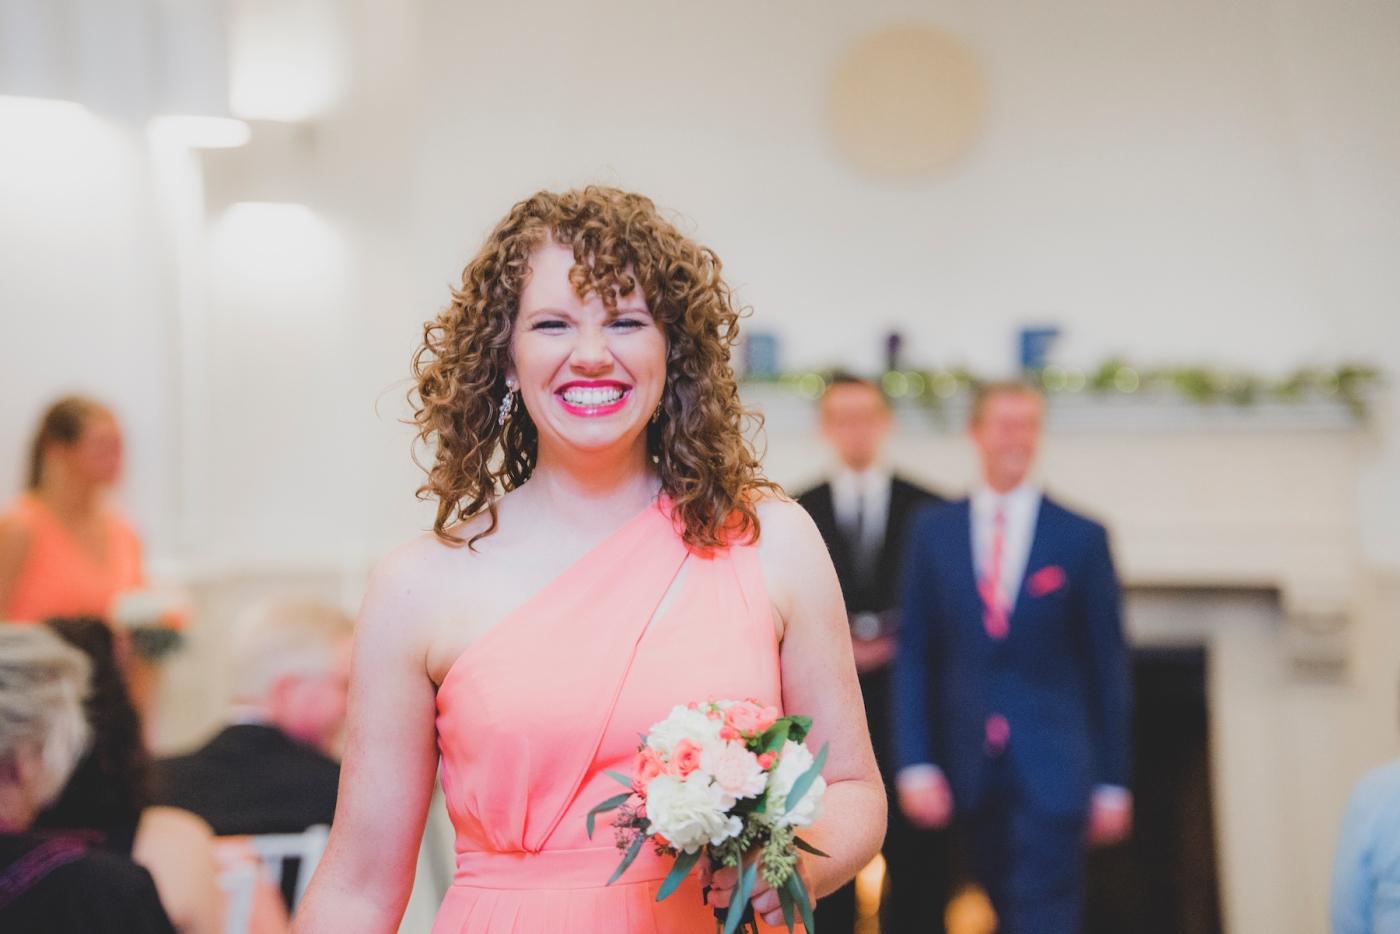 DSC_2742Everett_Wedding_Ballroom_Jane_Speleers_photography_Rachel_and_Edmund_Ceremony_2017